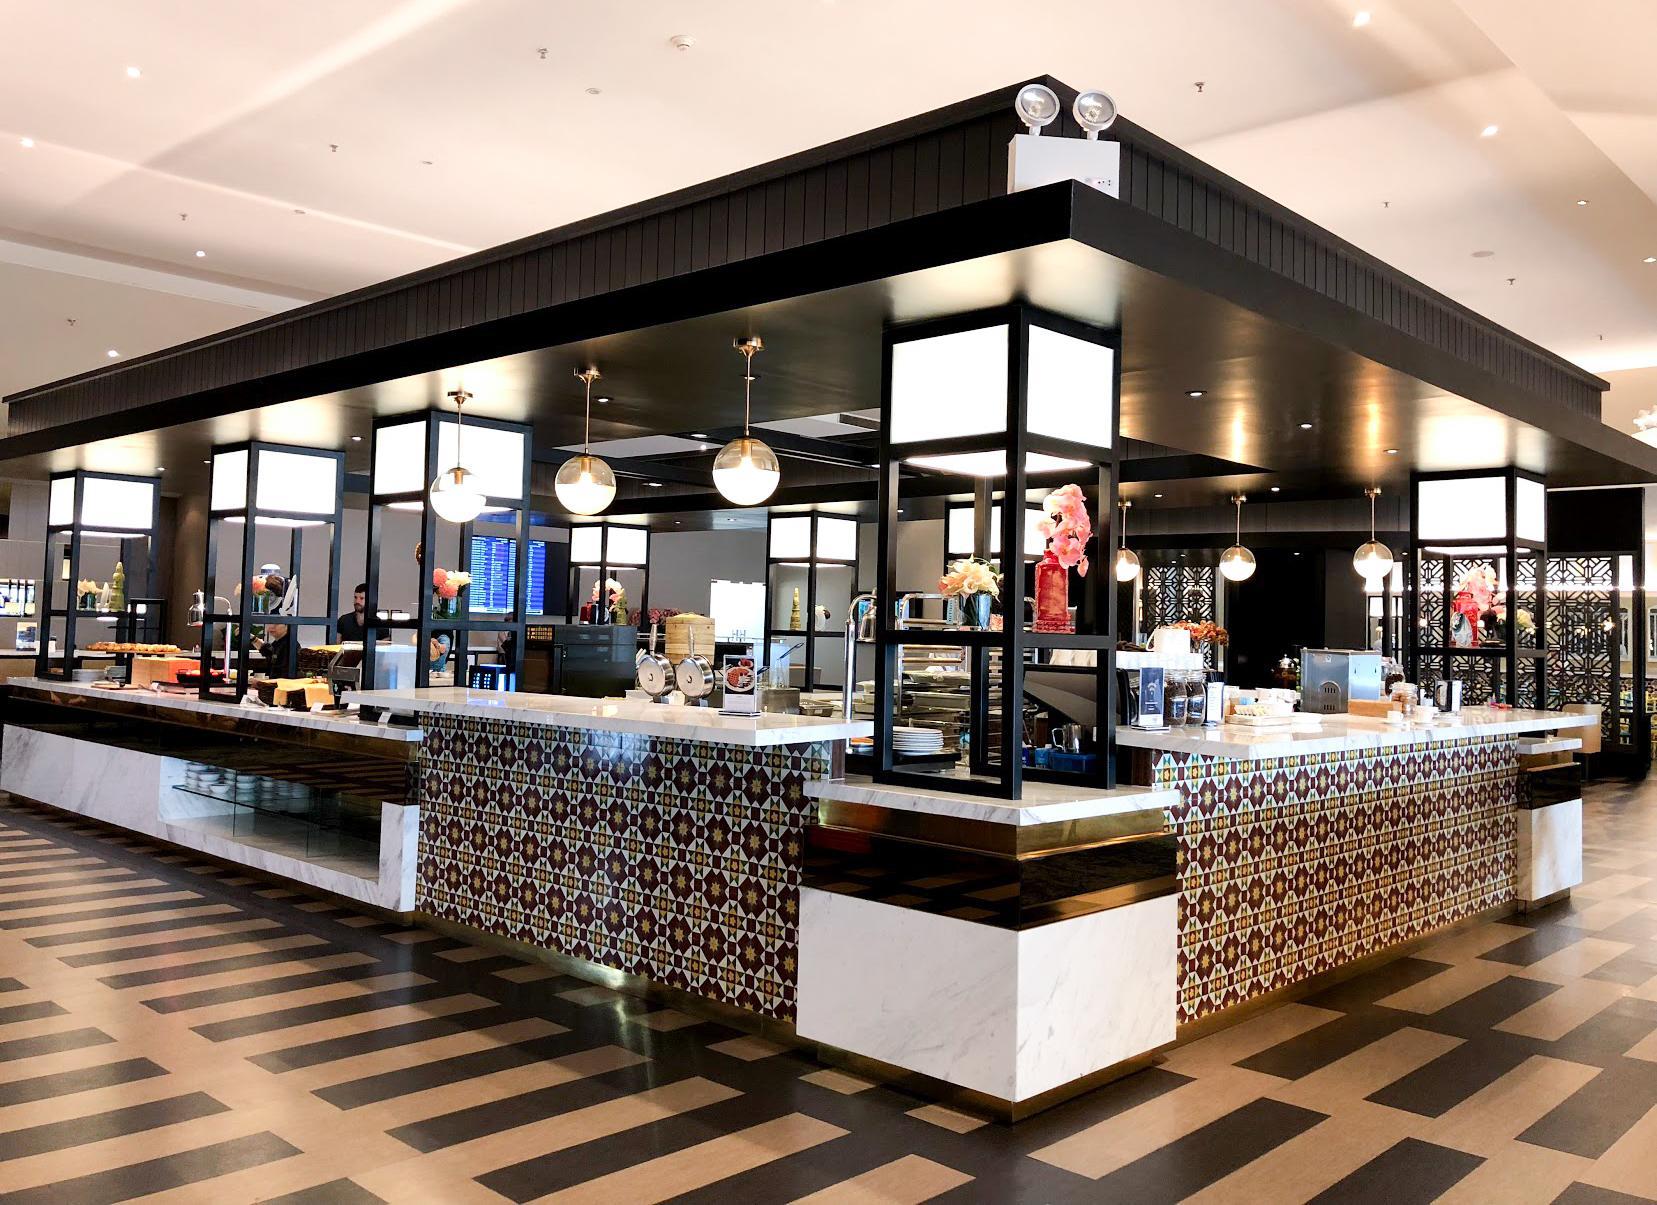 Malaysia Airlines Satellite Golden Lounge Kuala Lumpur open kitchen